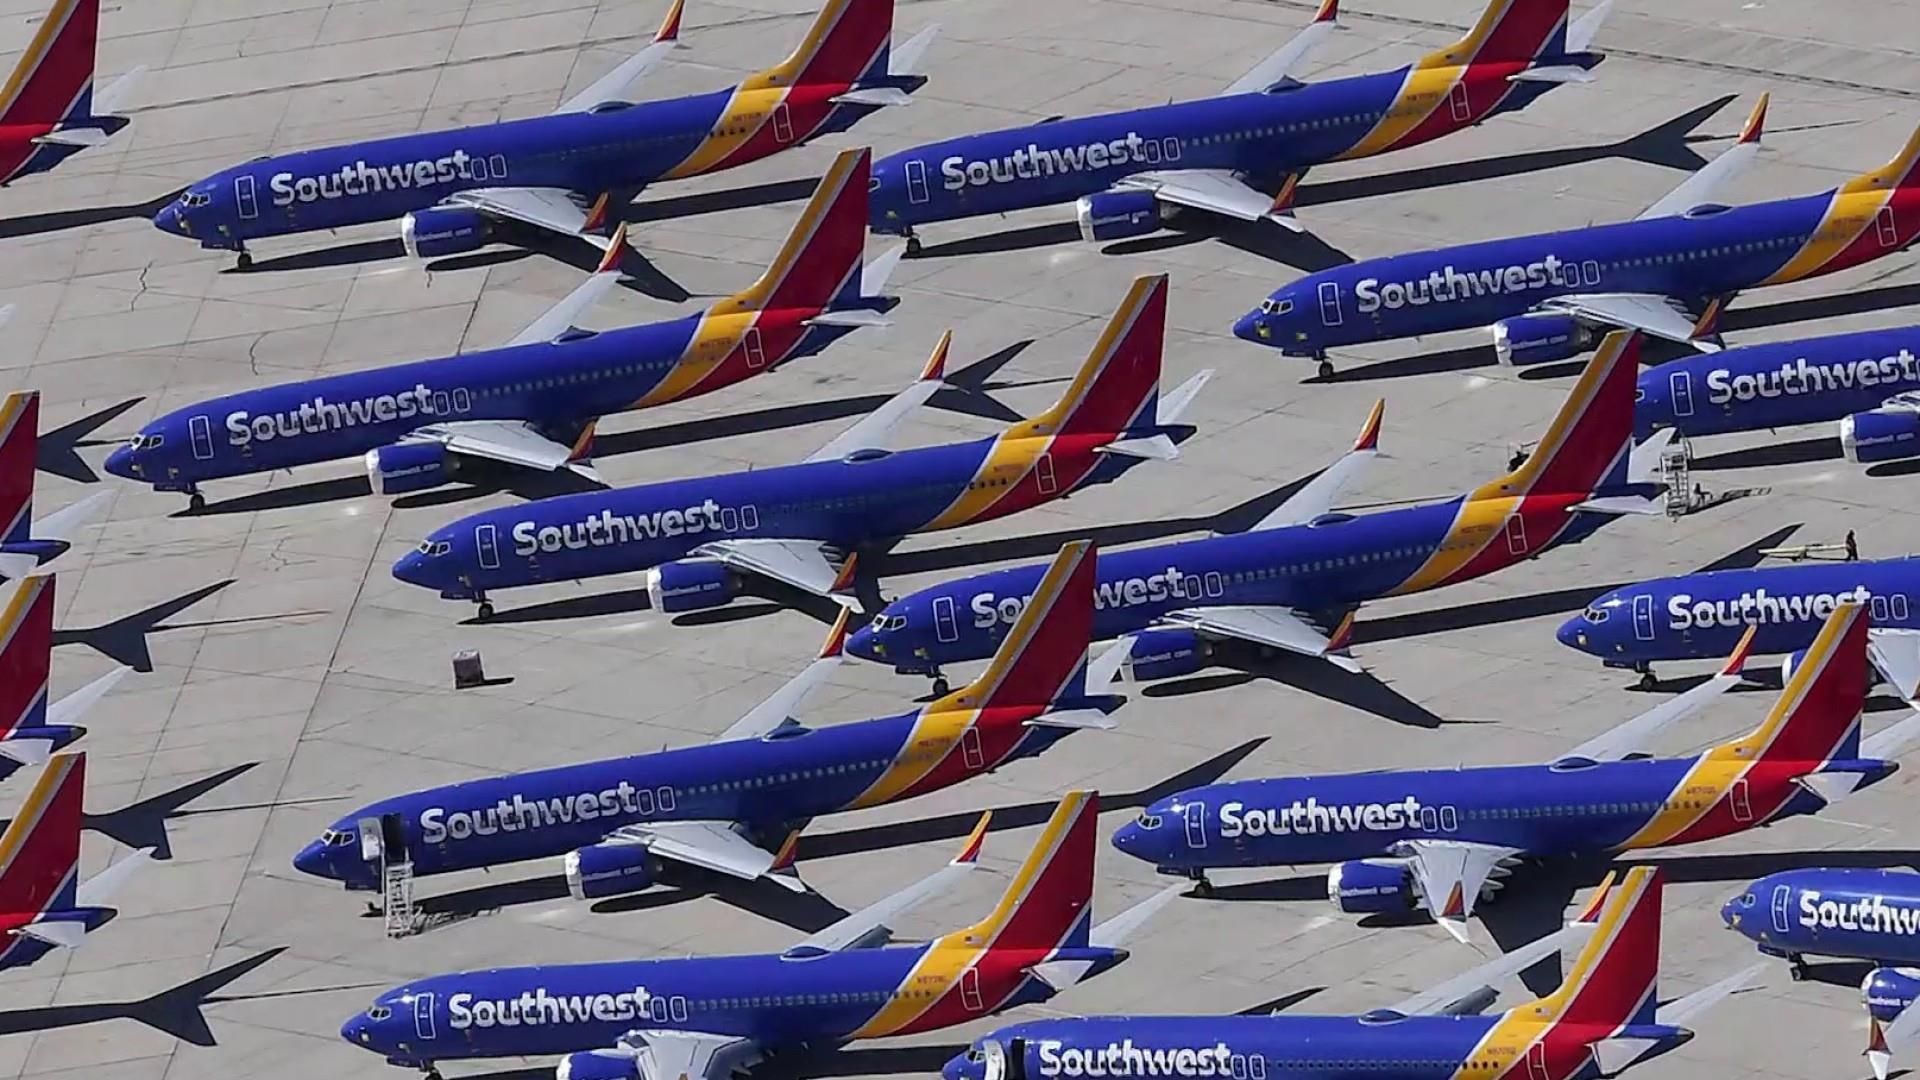 Boeing takes $4.9 billion hit over 737 Max grounding